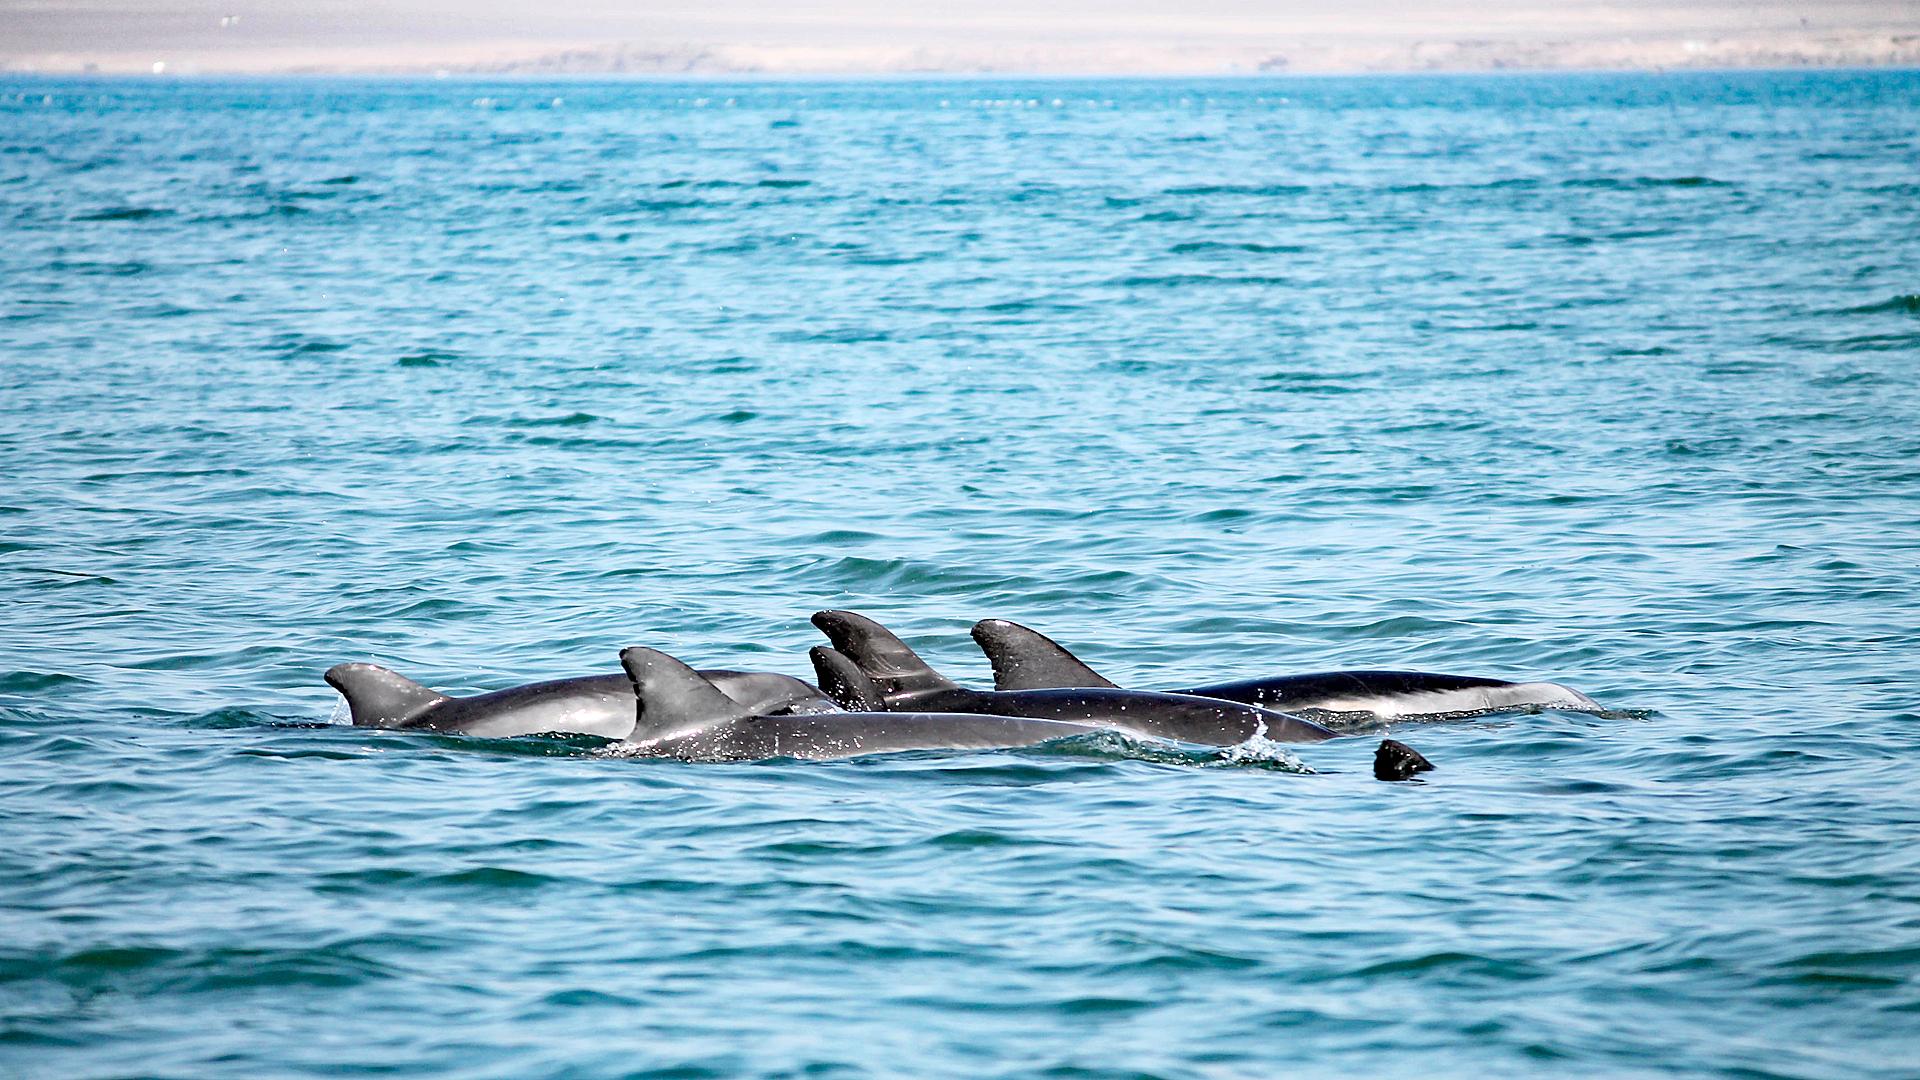 Delfinschutzprojekt Peru: Delfingruppe in der Paracas Bucht.